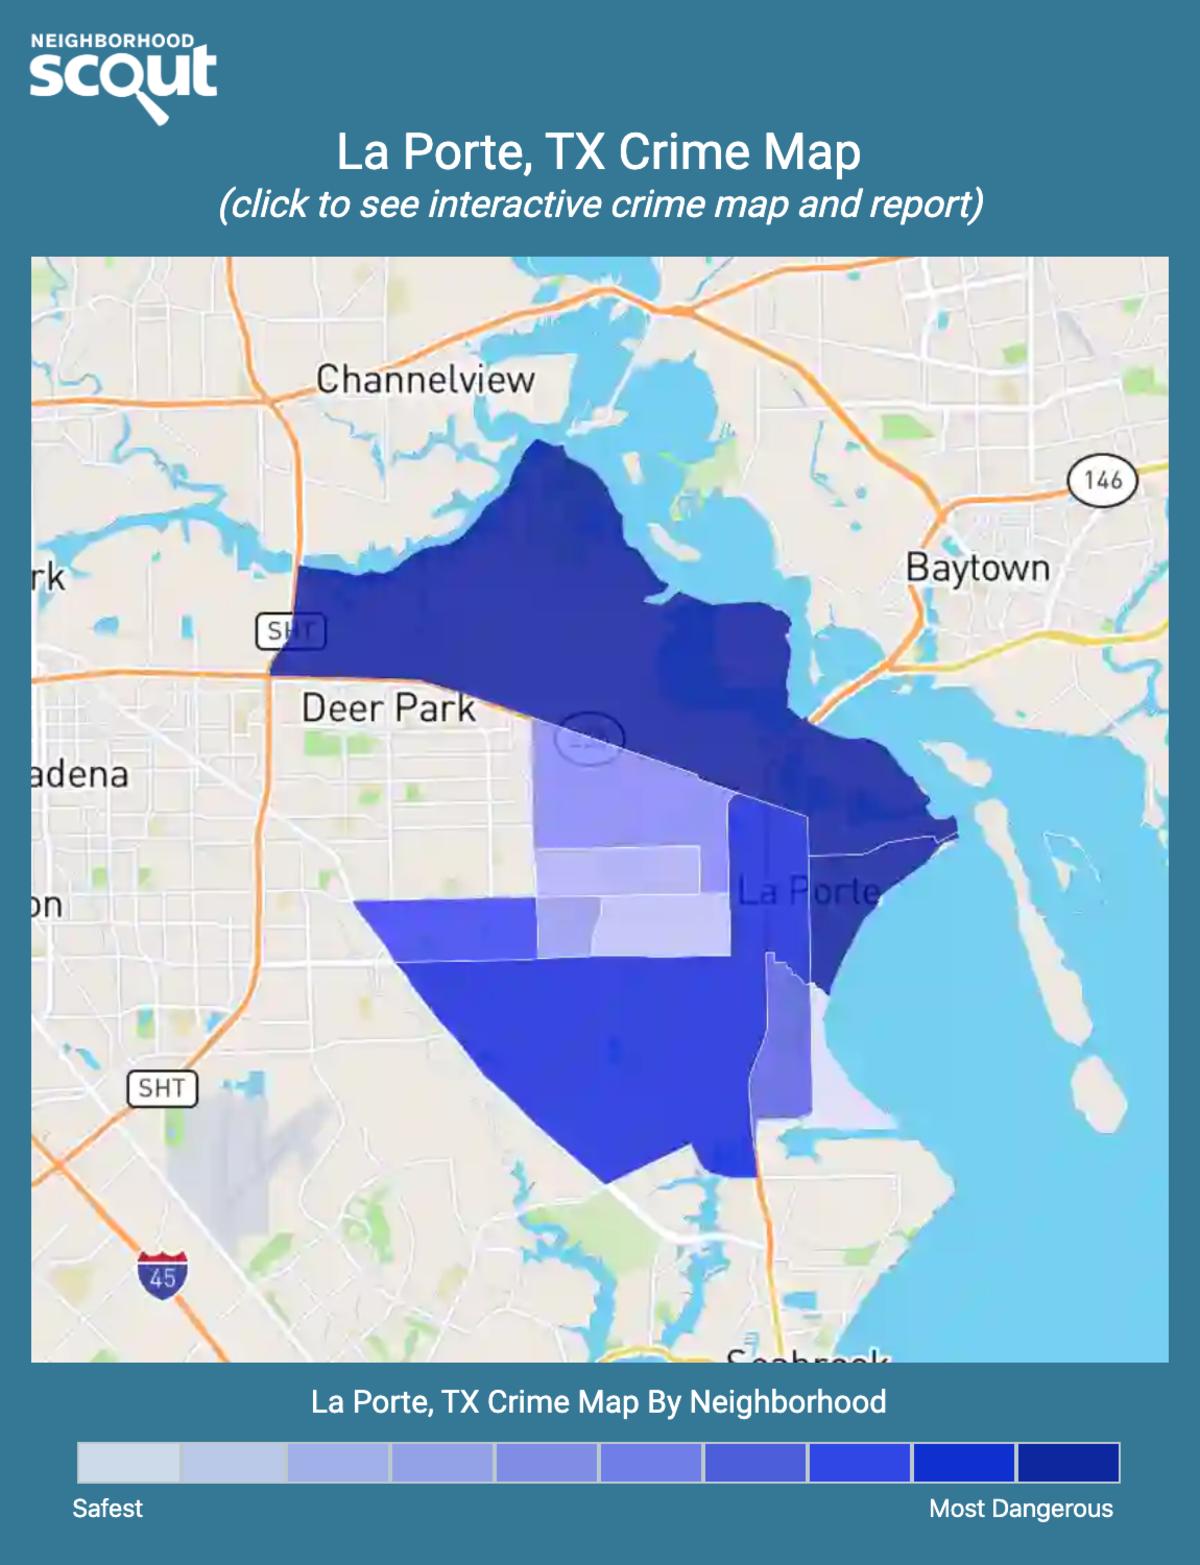 La Porte, Texas crime map